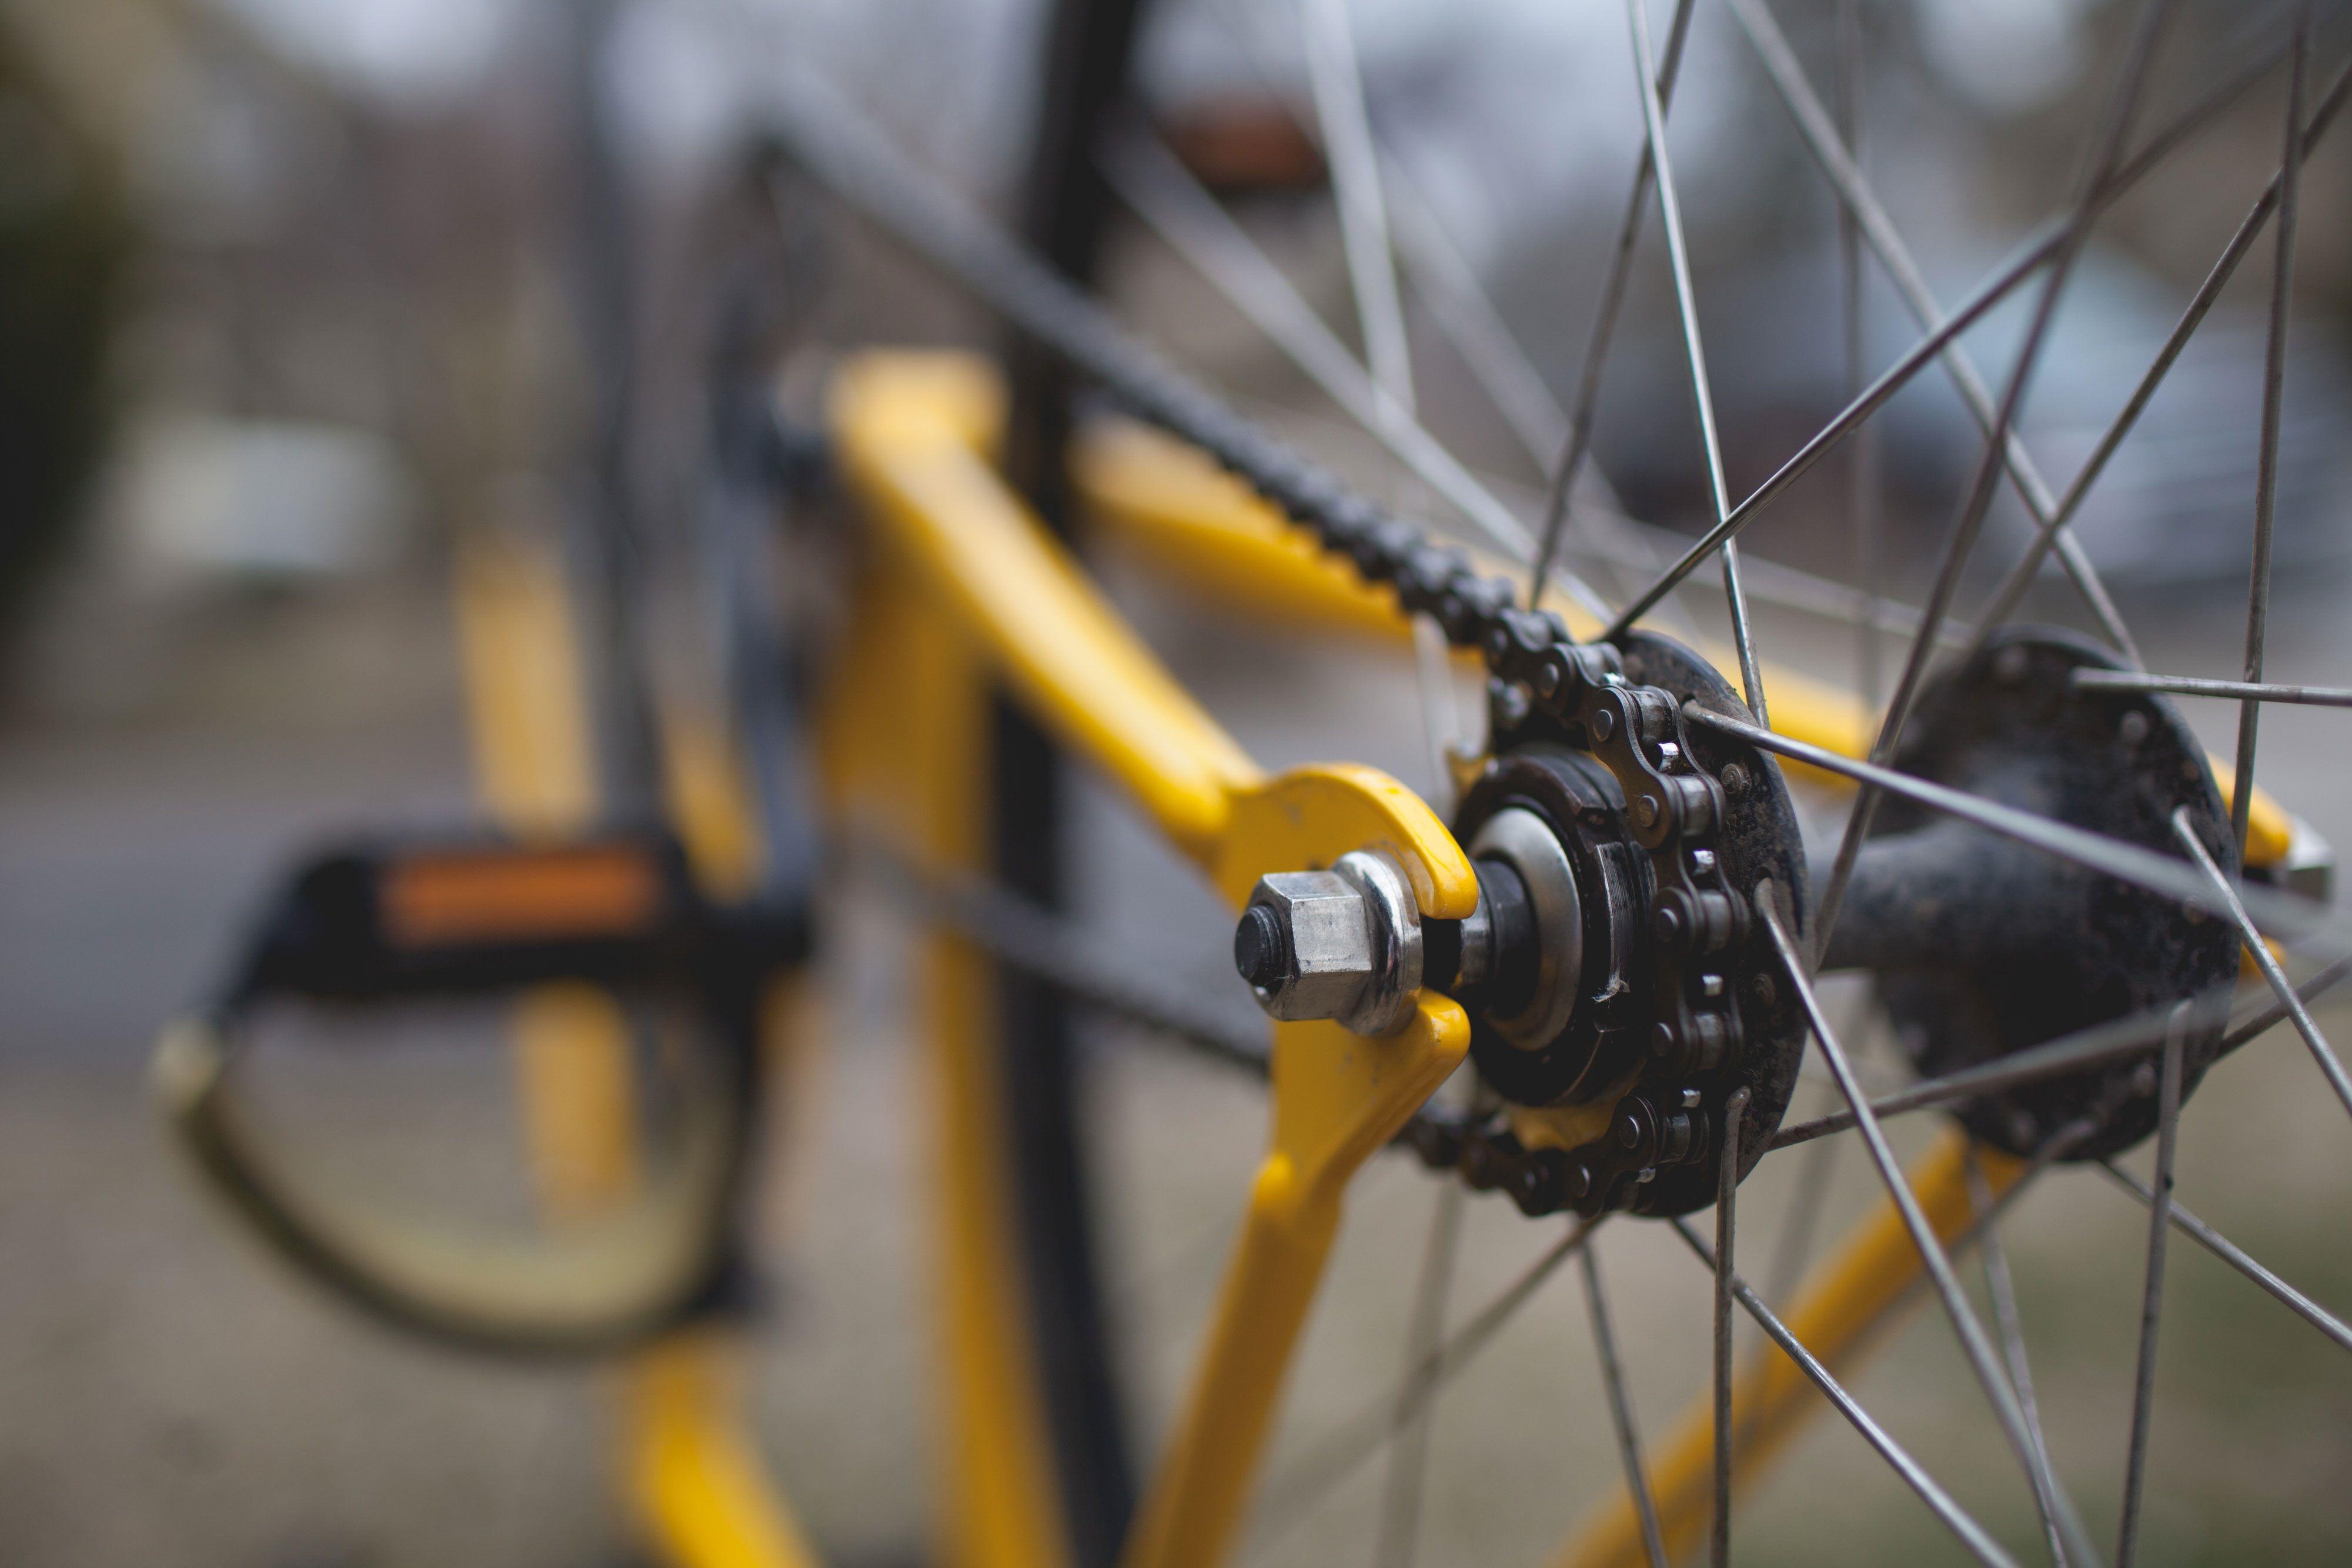 Bicycle, Bike, Chain, Cycle, Metal, HQ Photo